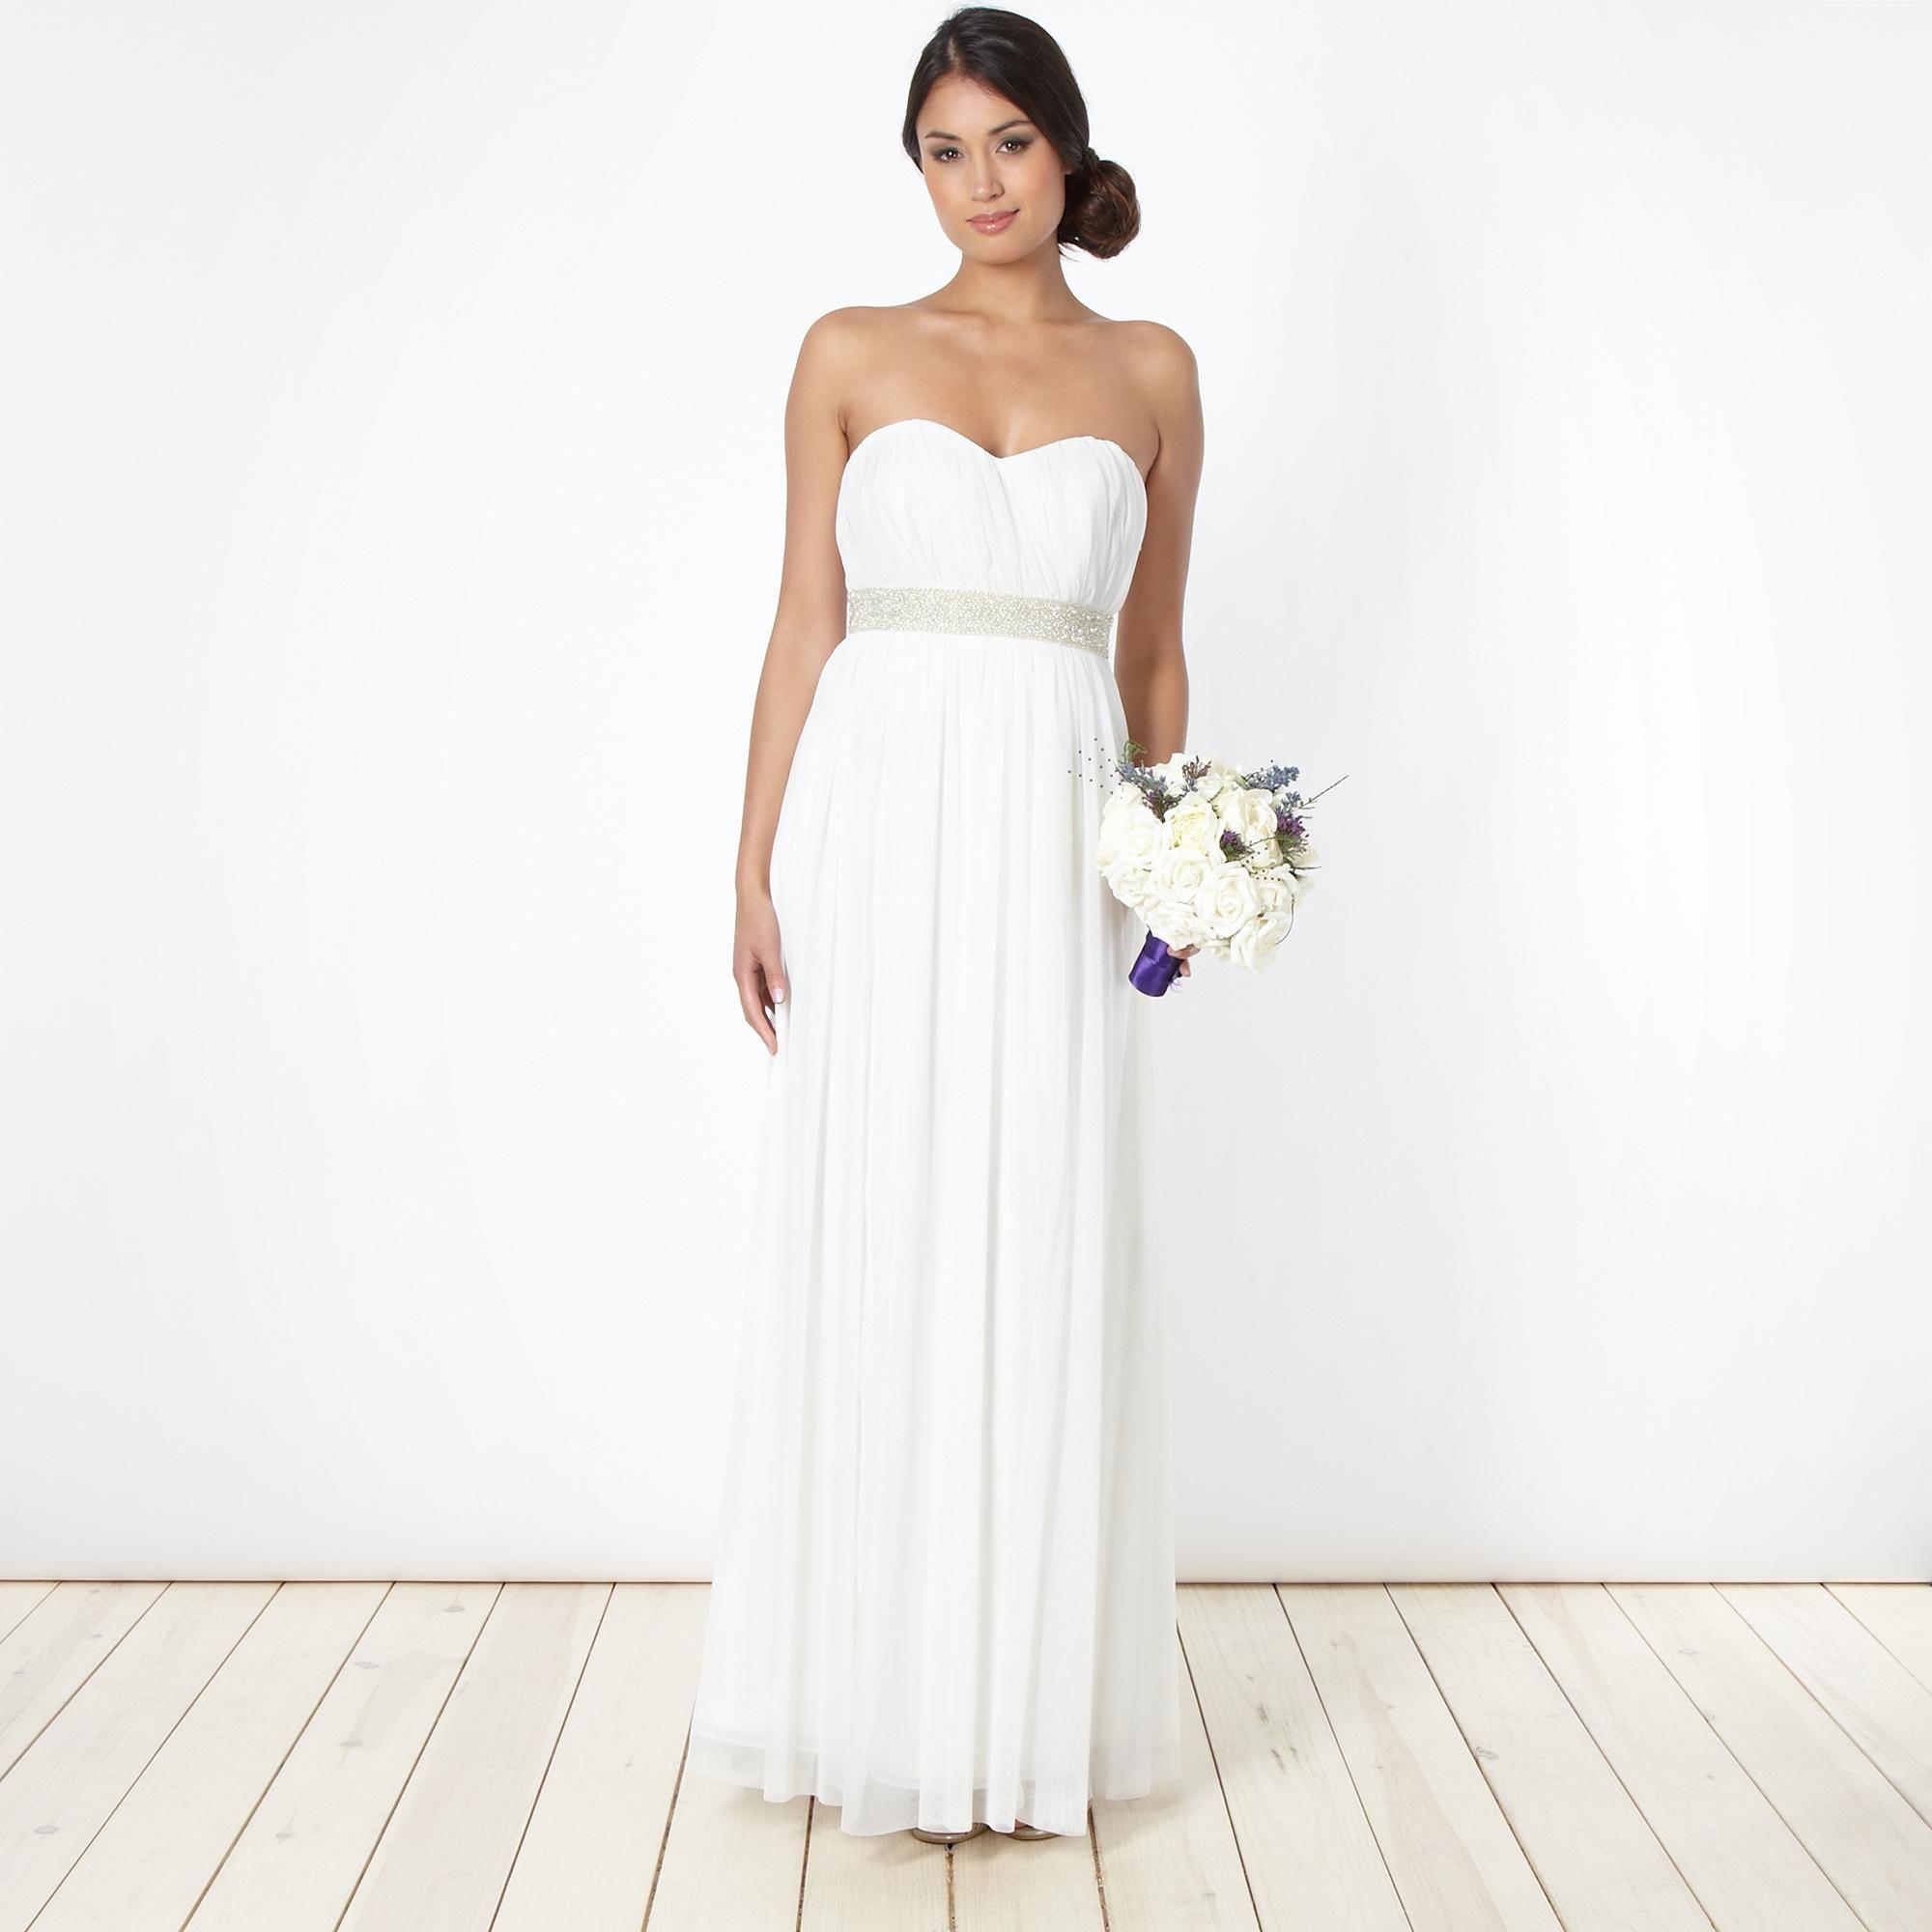 Ivory embellished maxi dress - Debenhams.com #Dress #Dresses #White ...